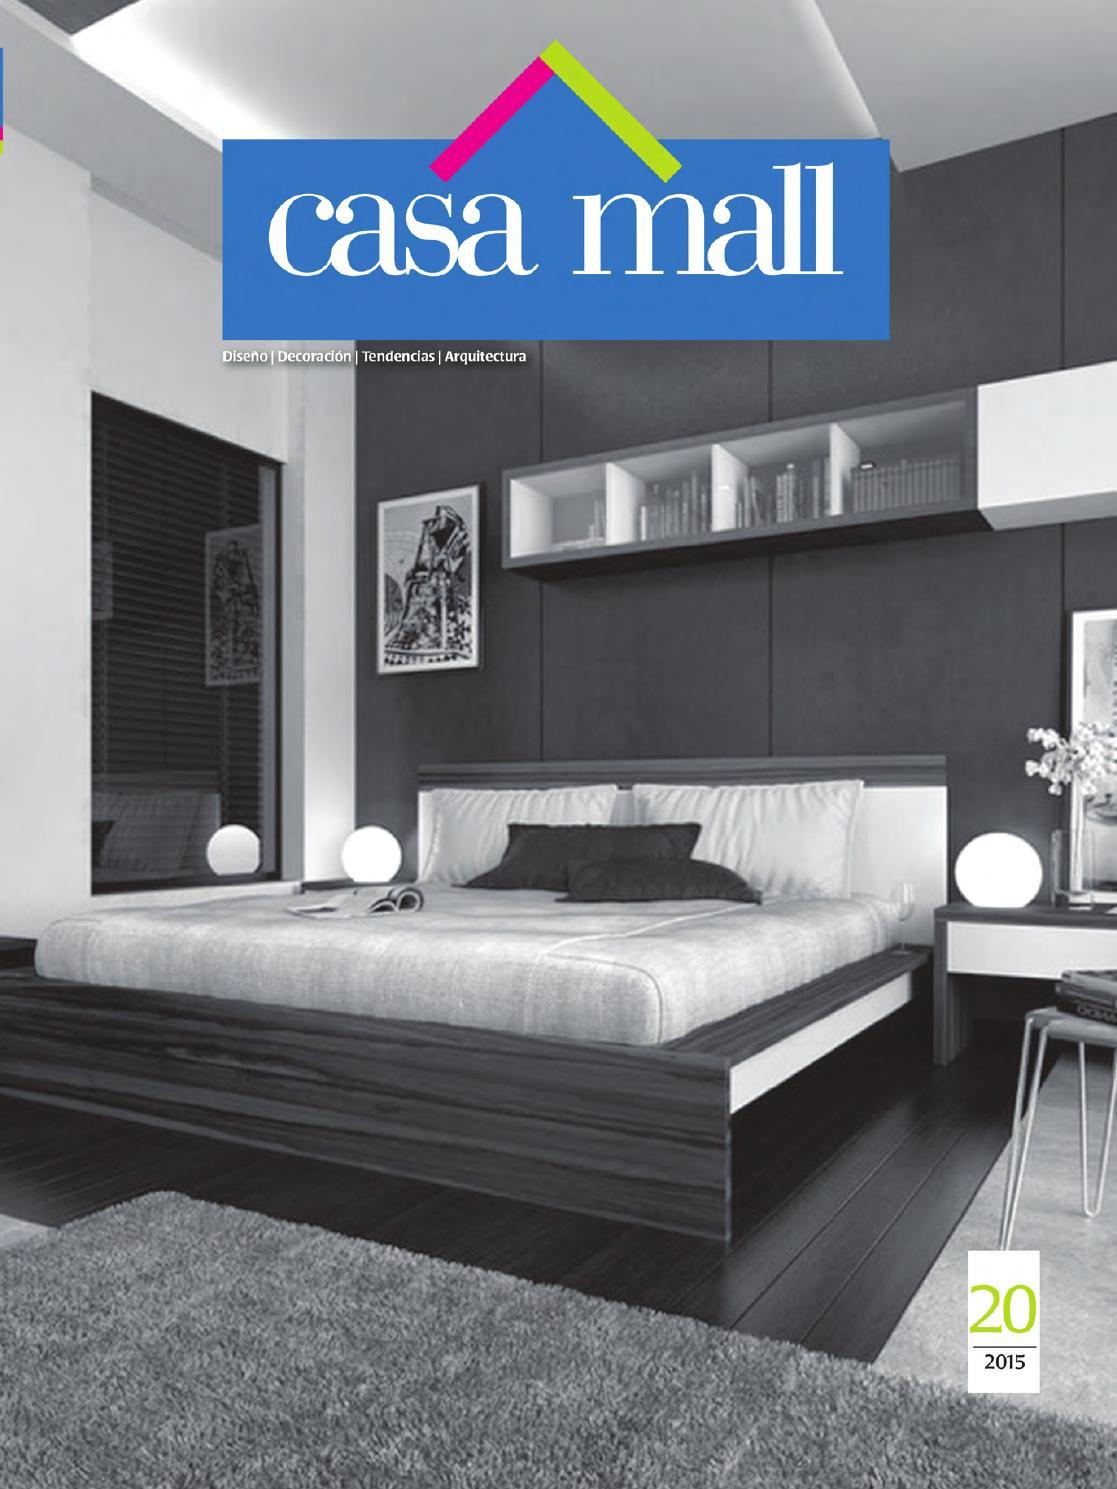 Revista Casa Mall Nro. 20 by Casa Mall - issuu